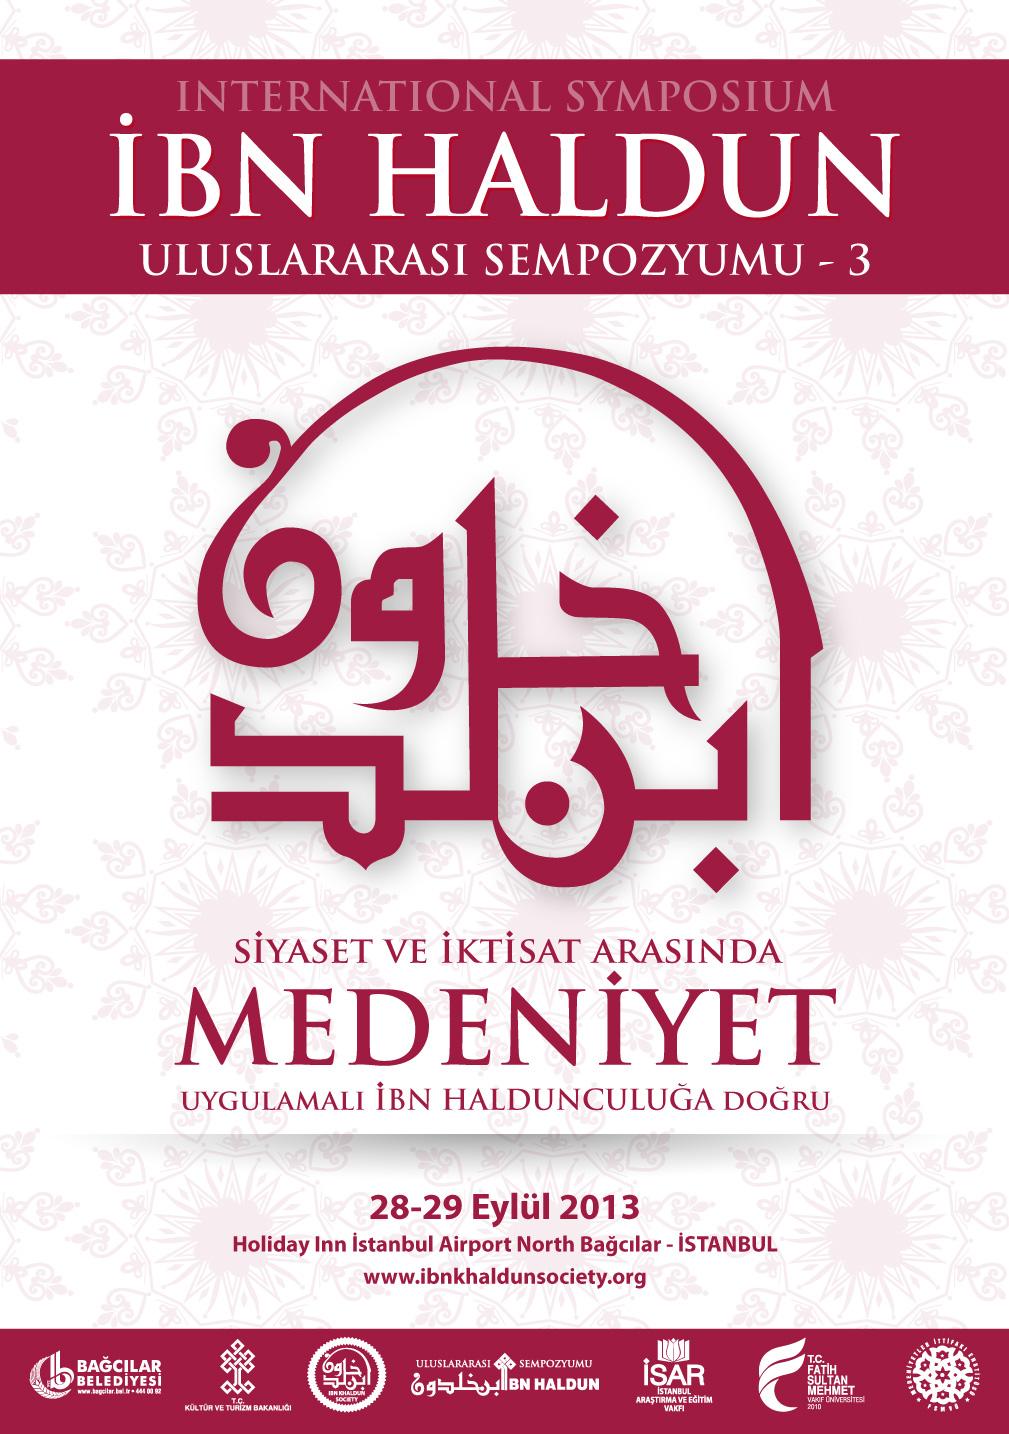 http://medit.fatihsultan.edu.tr/resimler/upload/IBN-Haldun-Uluslararasi-Sempozyumu-3-1110913.jpg